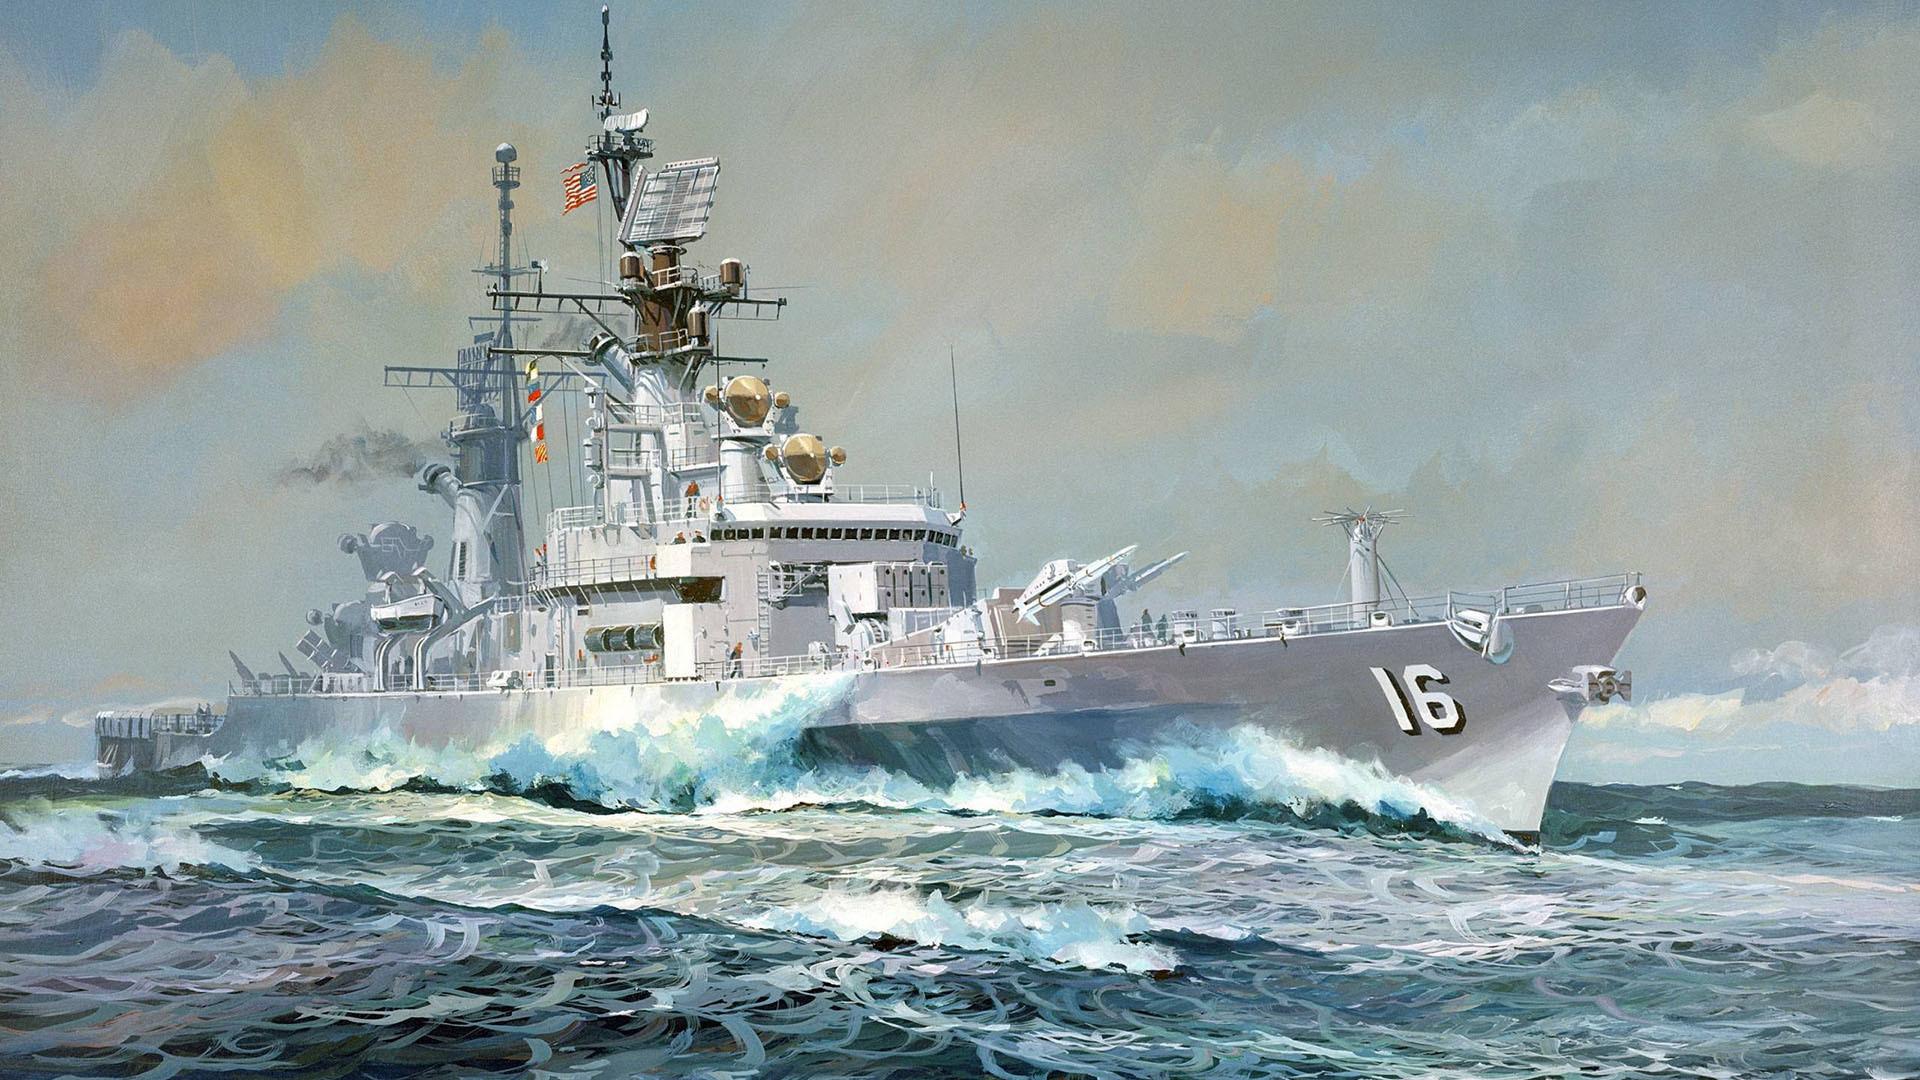 Navy Ship Wallpaper (64+ images)